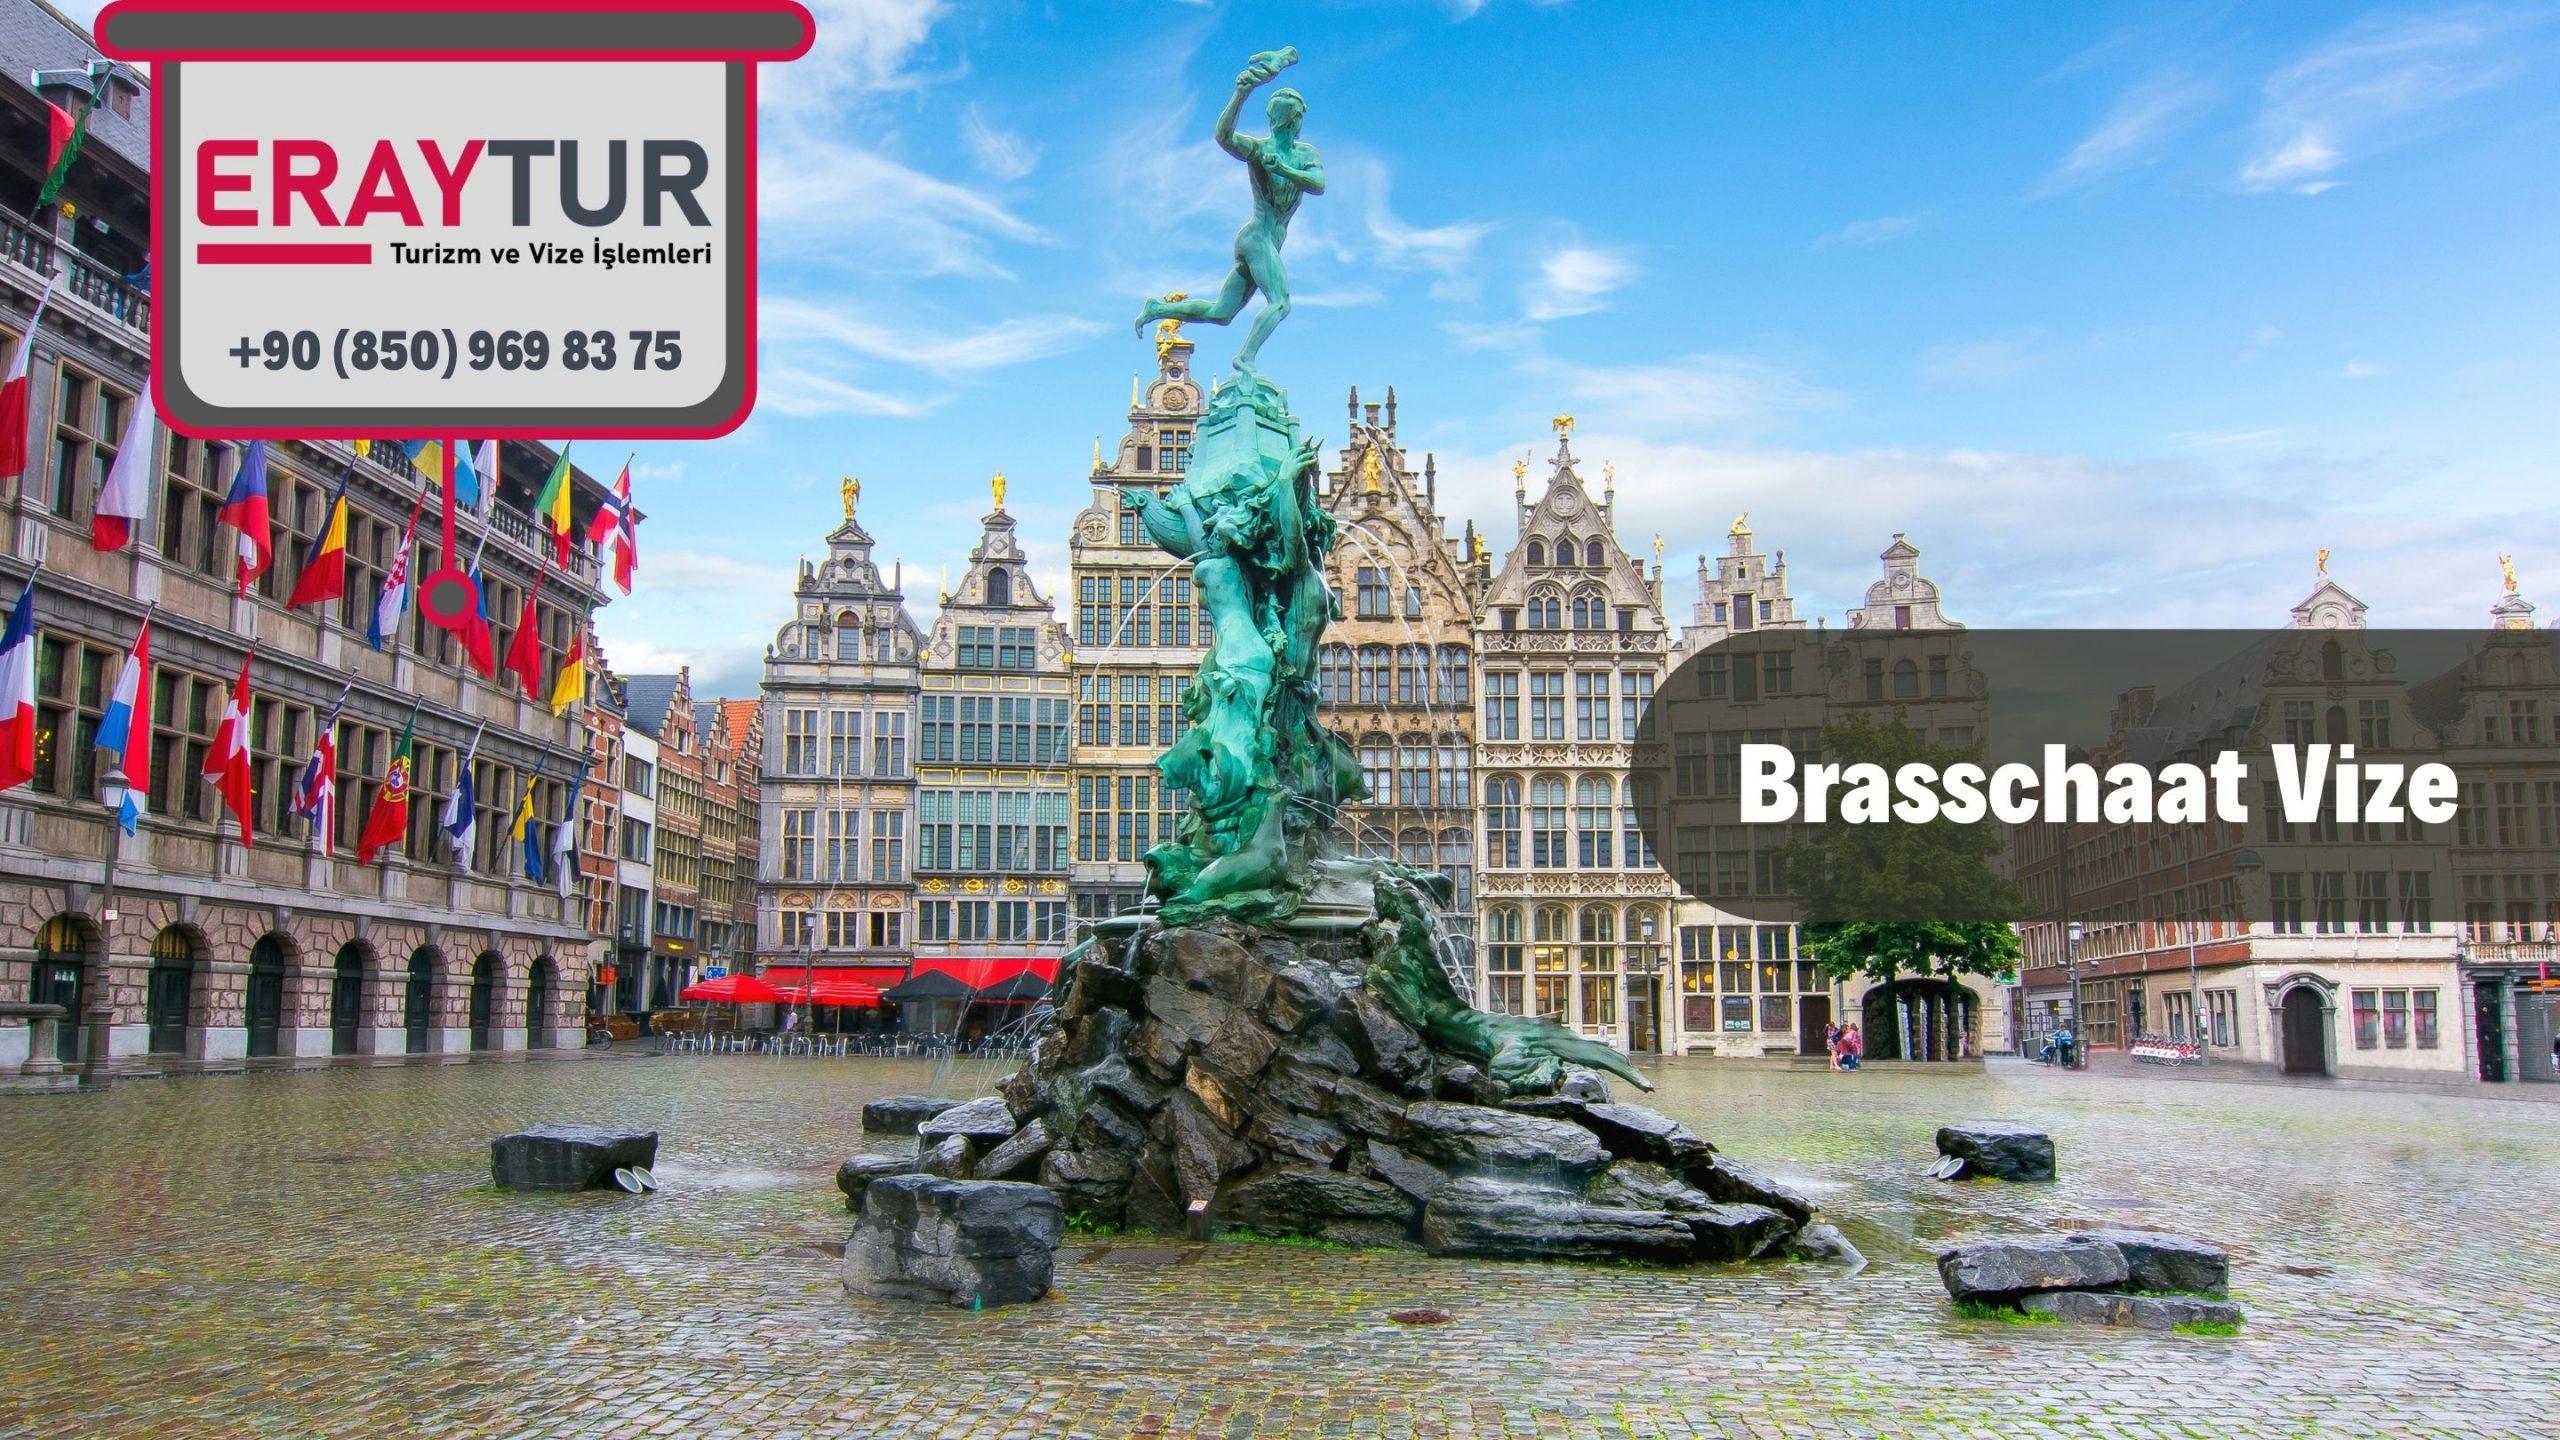 Belçika Brasschaat Vize Başvurusu